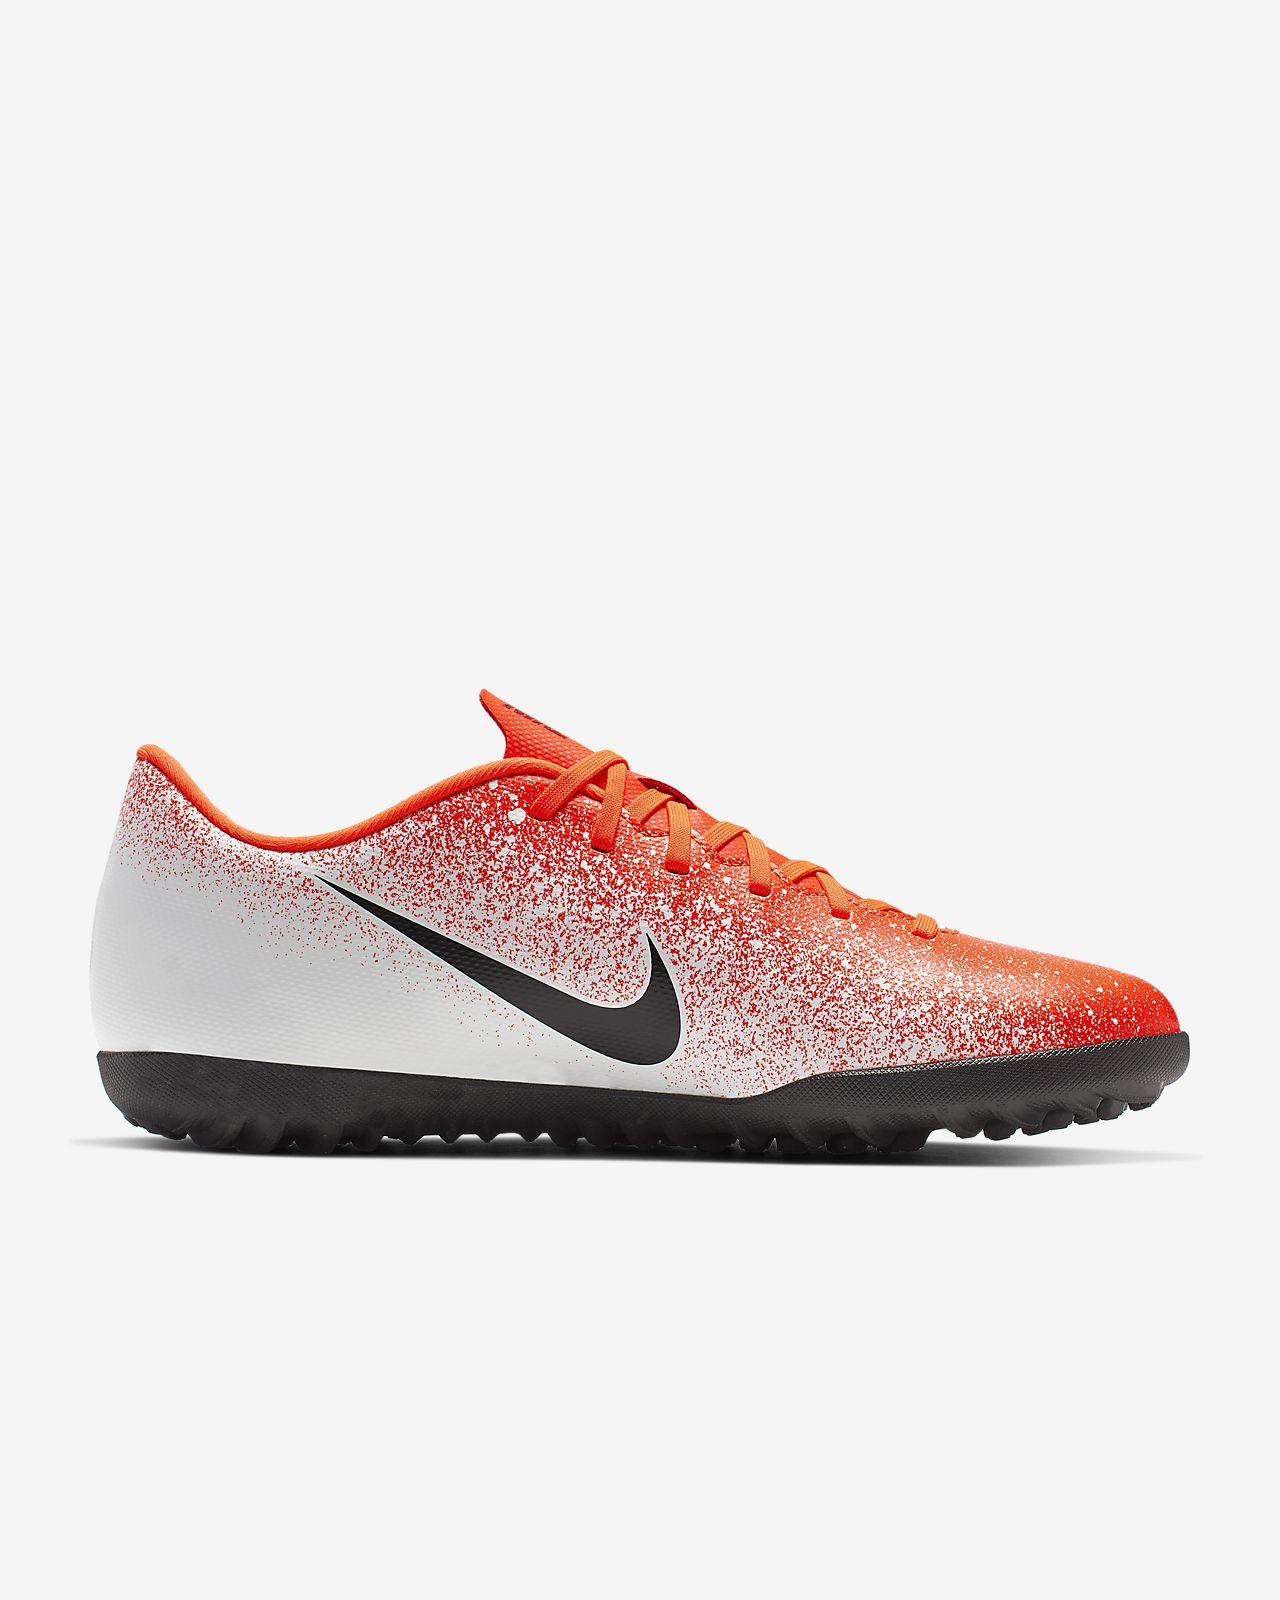 new york 6be29 5035c Nike MercurialX Vapor XII Club Turf Football Shoe. Nike.com VN